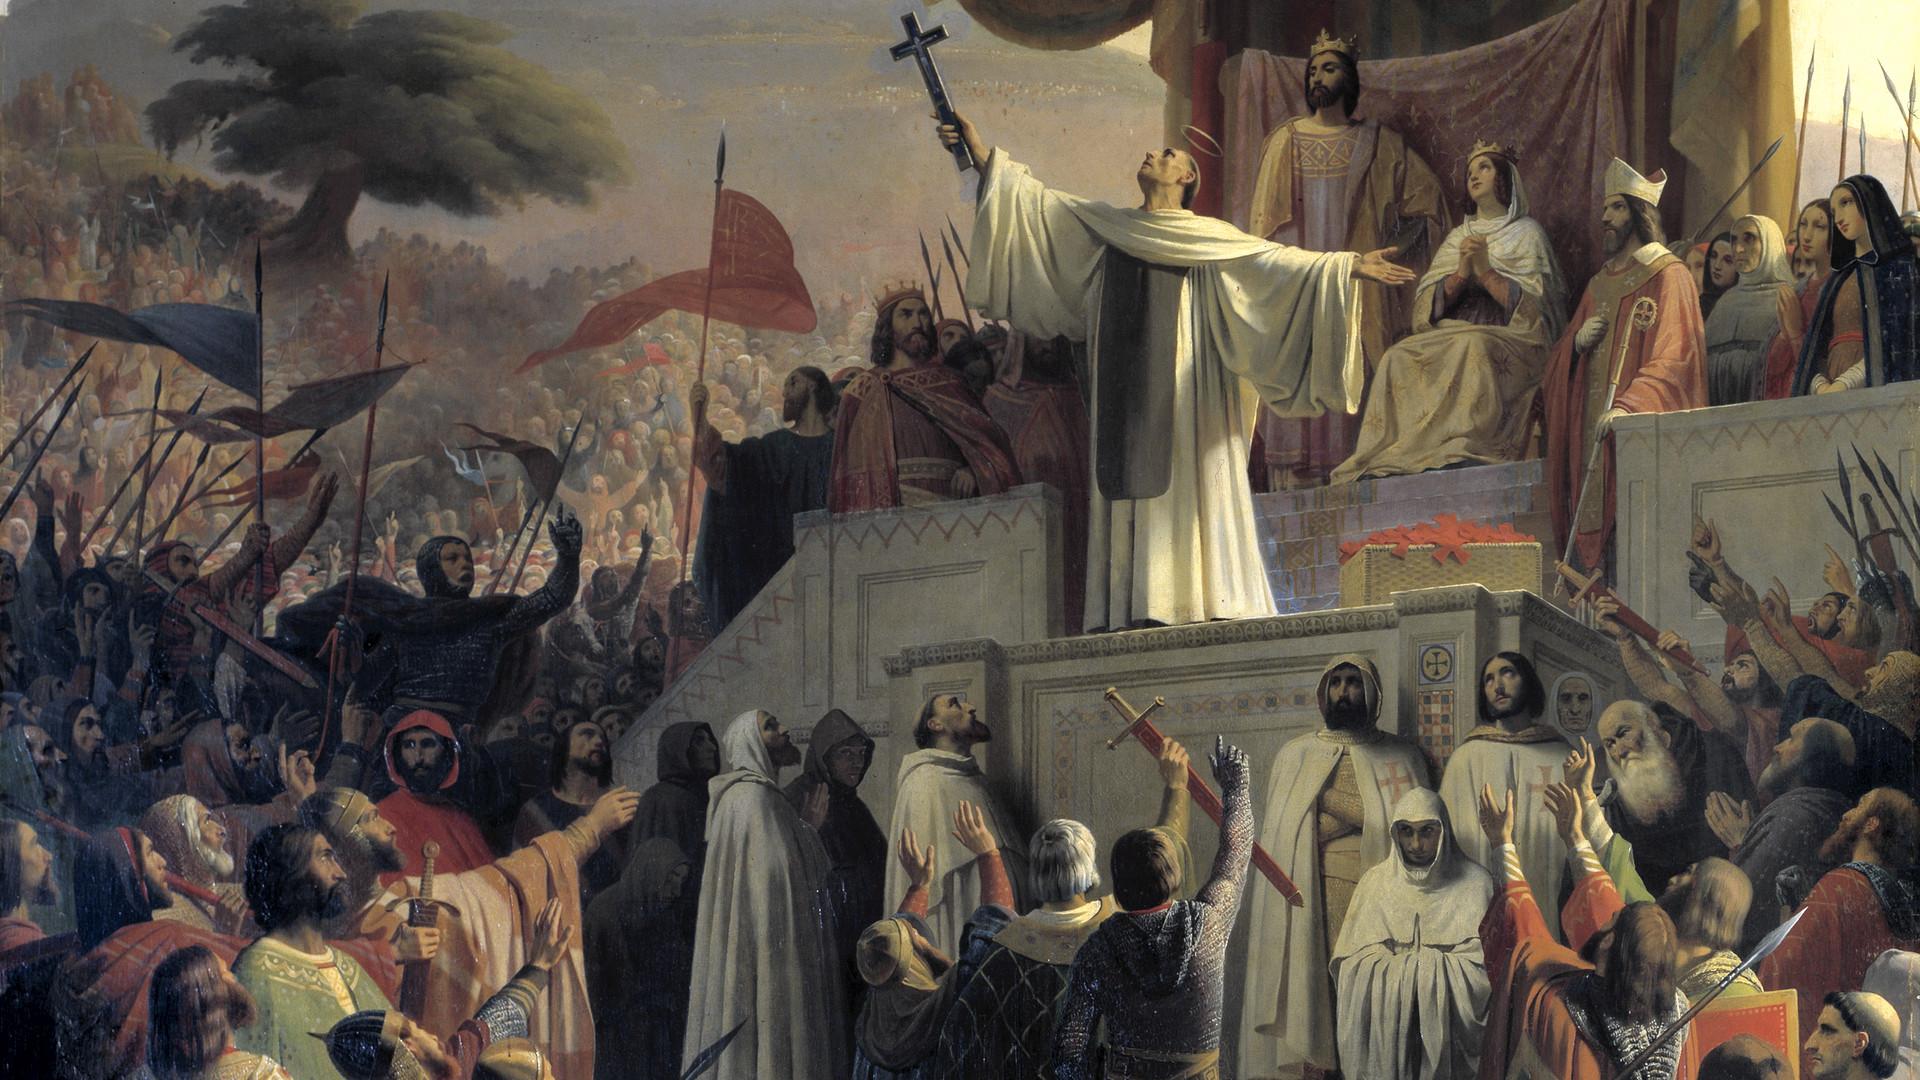 Res: 1920x1080, More on Dan Jones Knights Templar